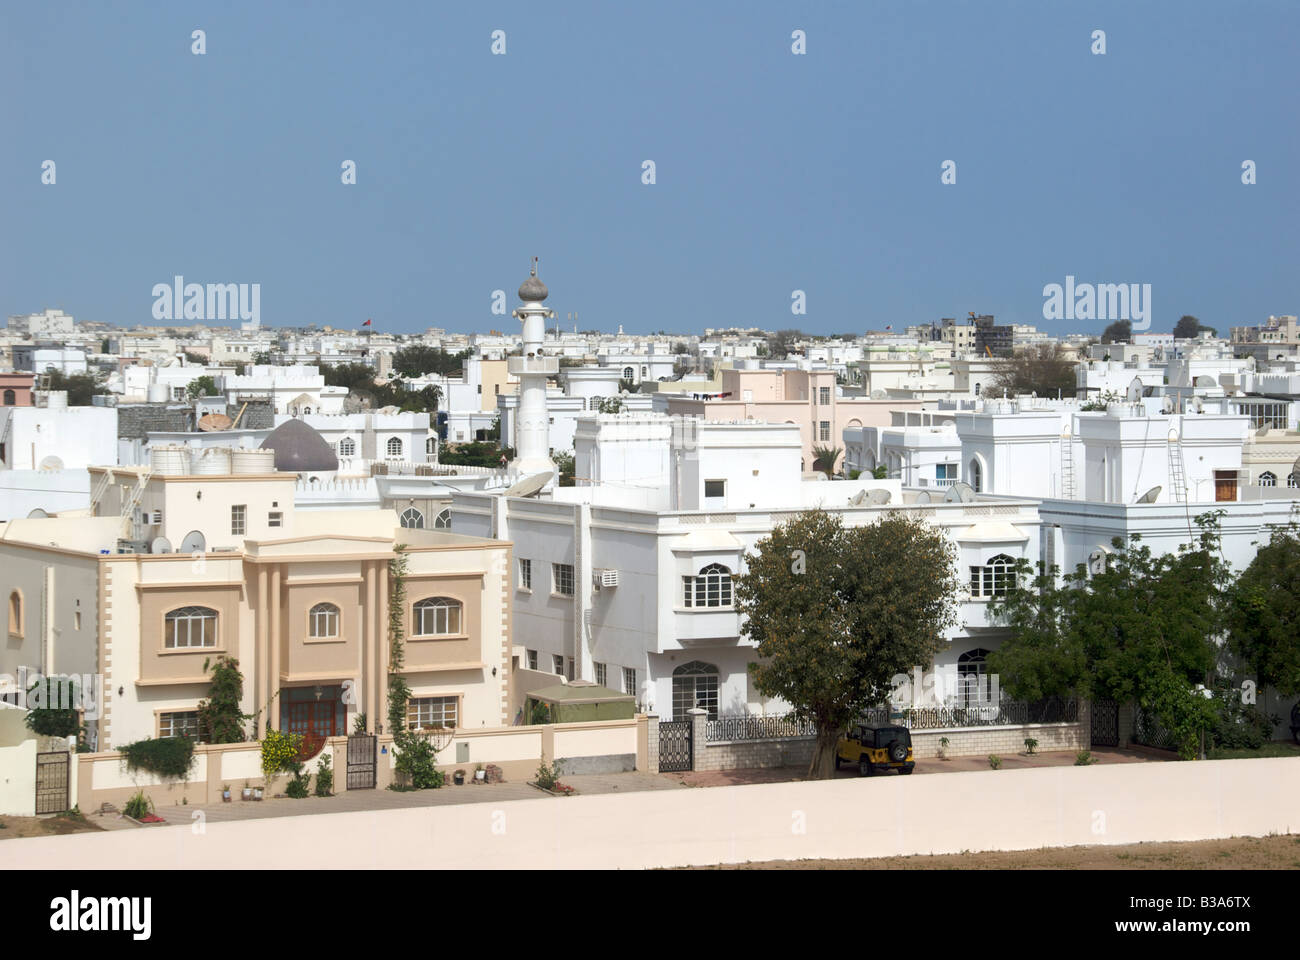 Housing and apartments Al Ghubrah Muscat Oman - Stock Image